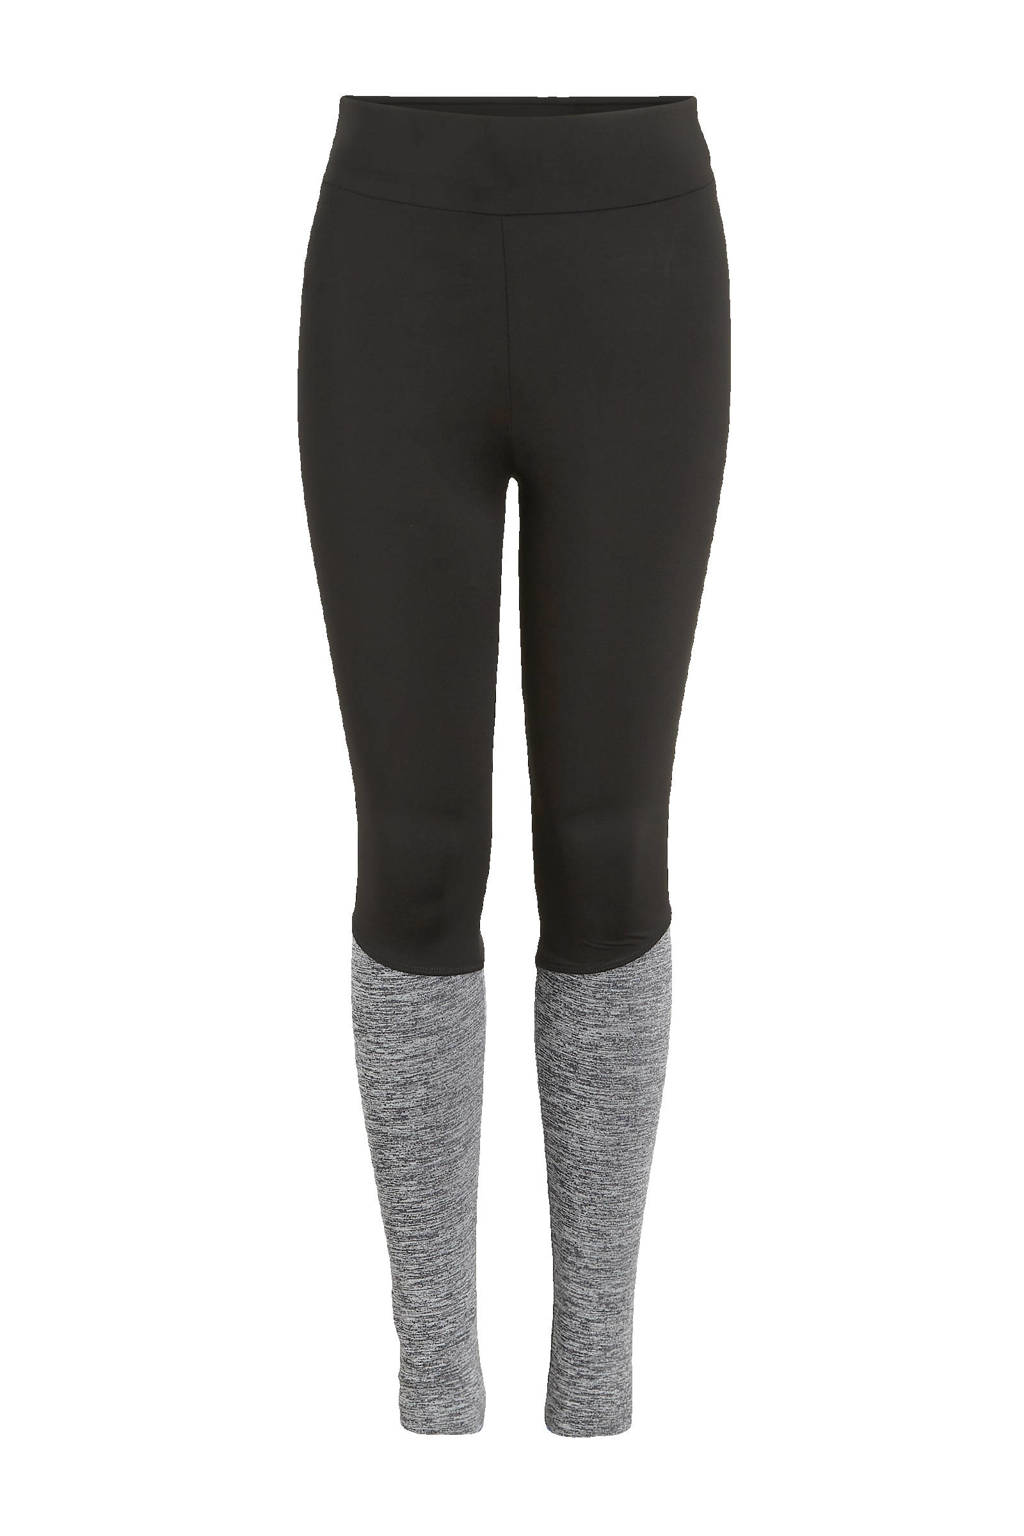 NAME IT KIDS legging Tuvla zwart/grijs melange, Zwart/grijs melange